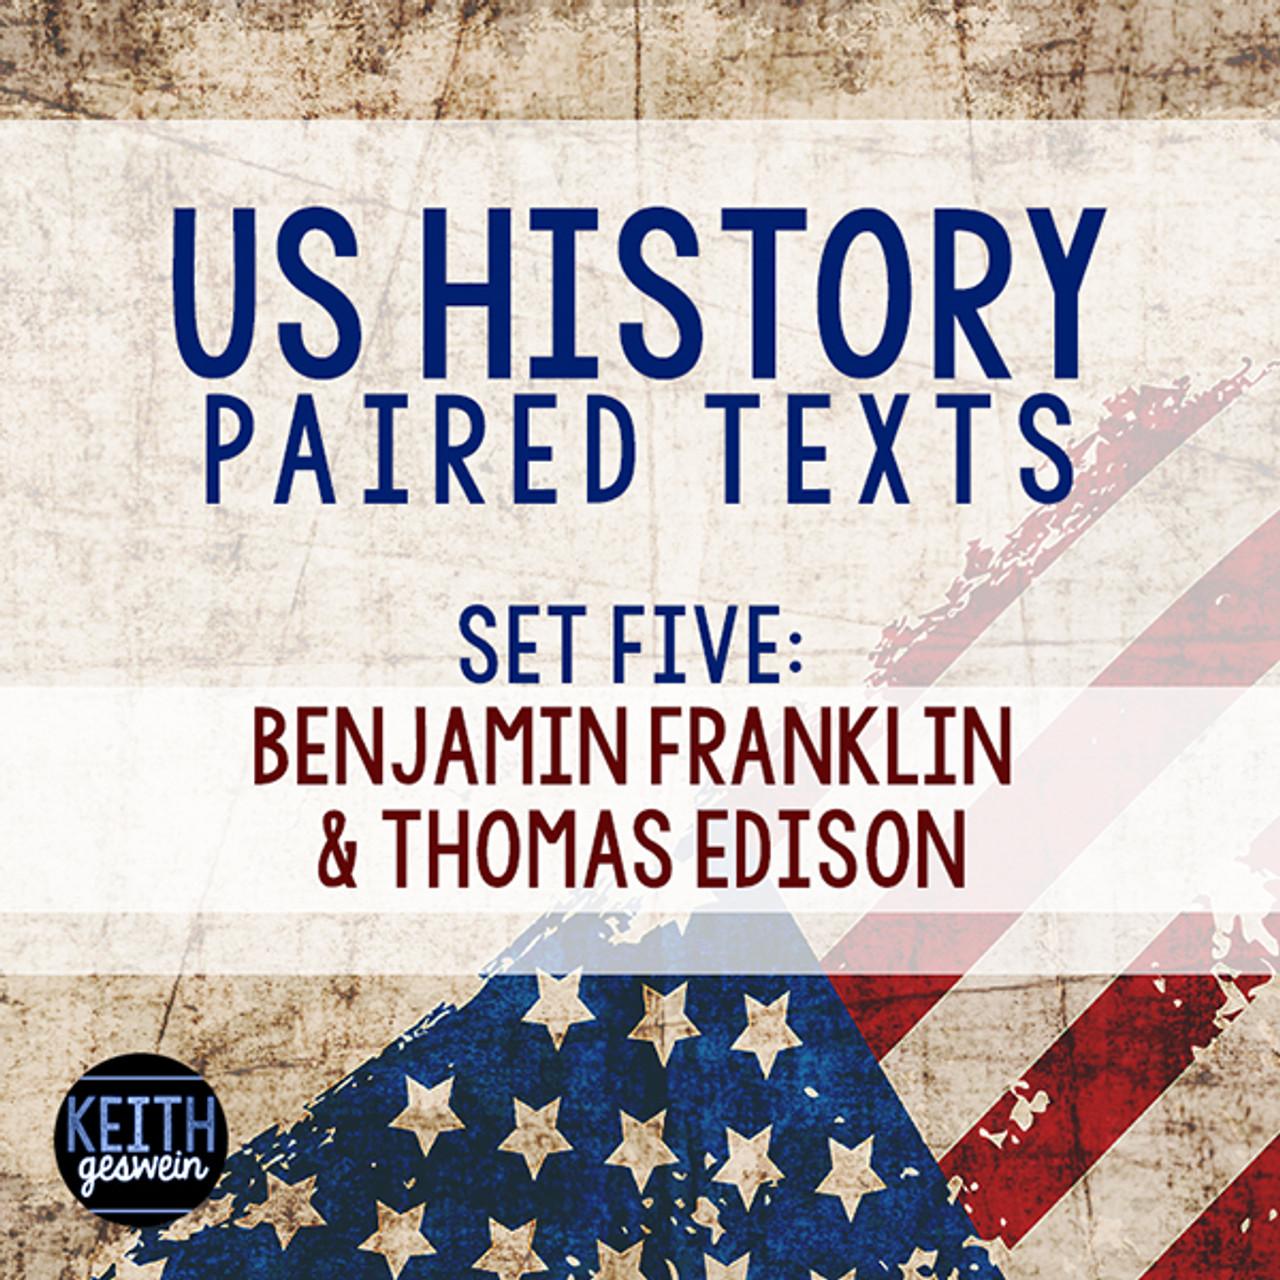 US History Paired Texts:  Benjamin Franklin and Thomas Edison